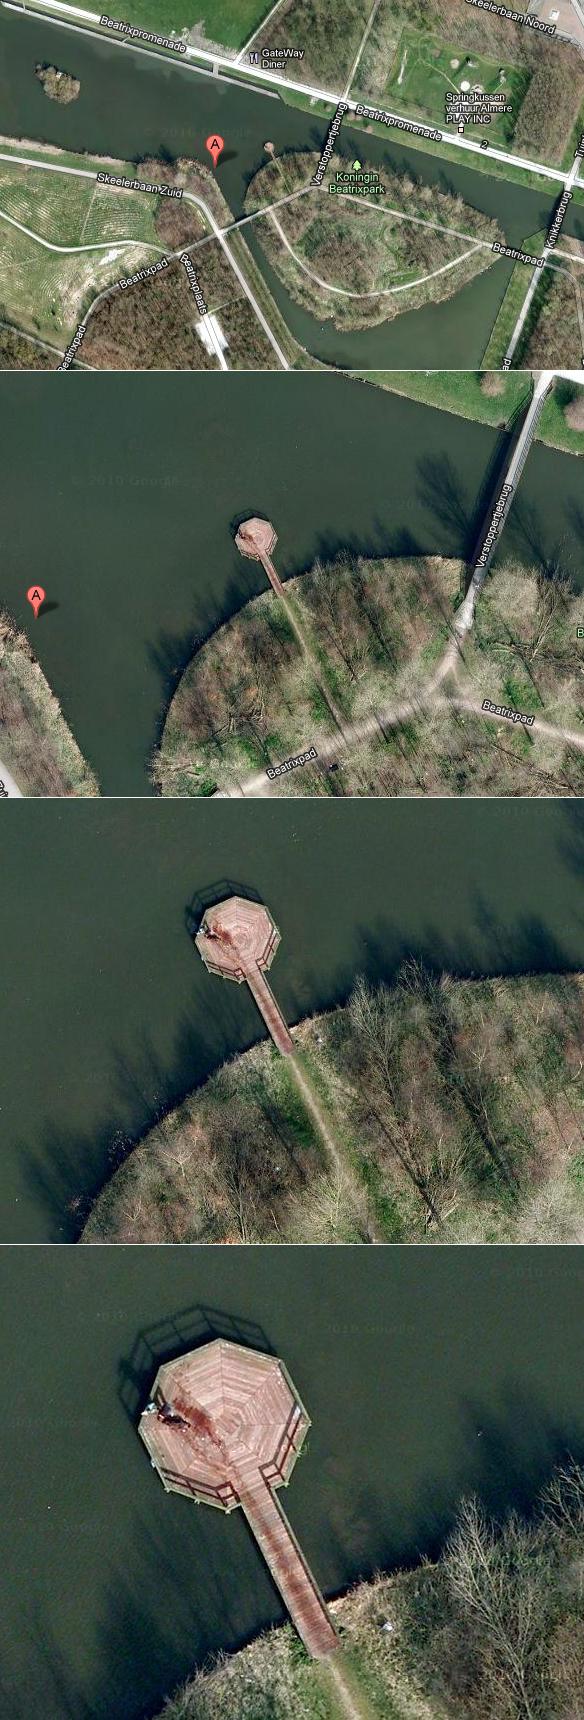 Murder on Google maps!. Koningin Beatrixpark, Beatrixpromenade, Almere-Stad, Almere, Nizozemska.